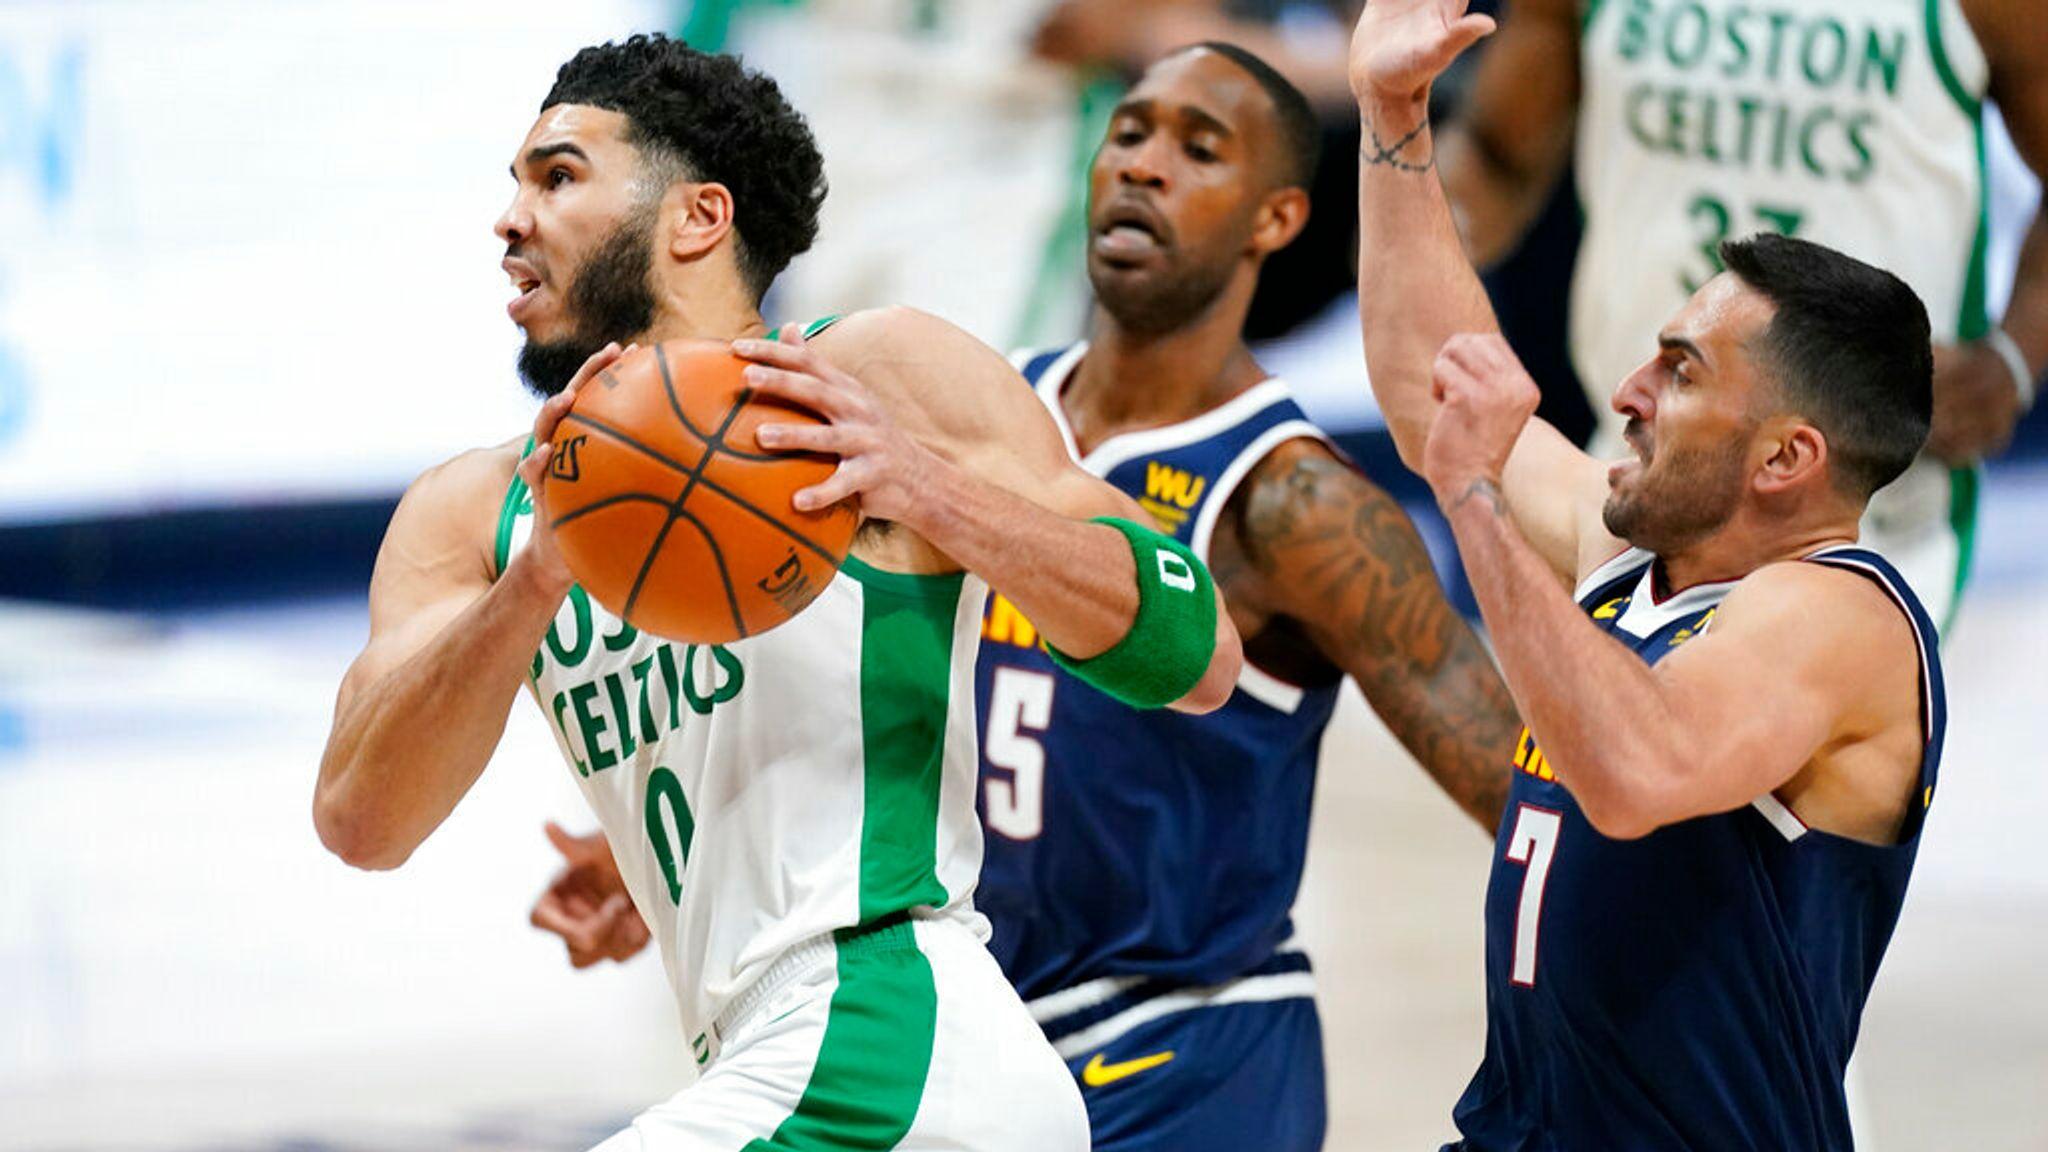 AP - Boston Celtics forward Jayson Tatum, left, drives the lane past Denver Nuggets forward Will Barton,